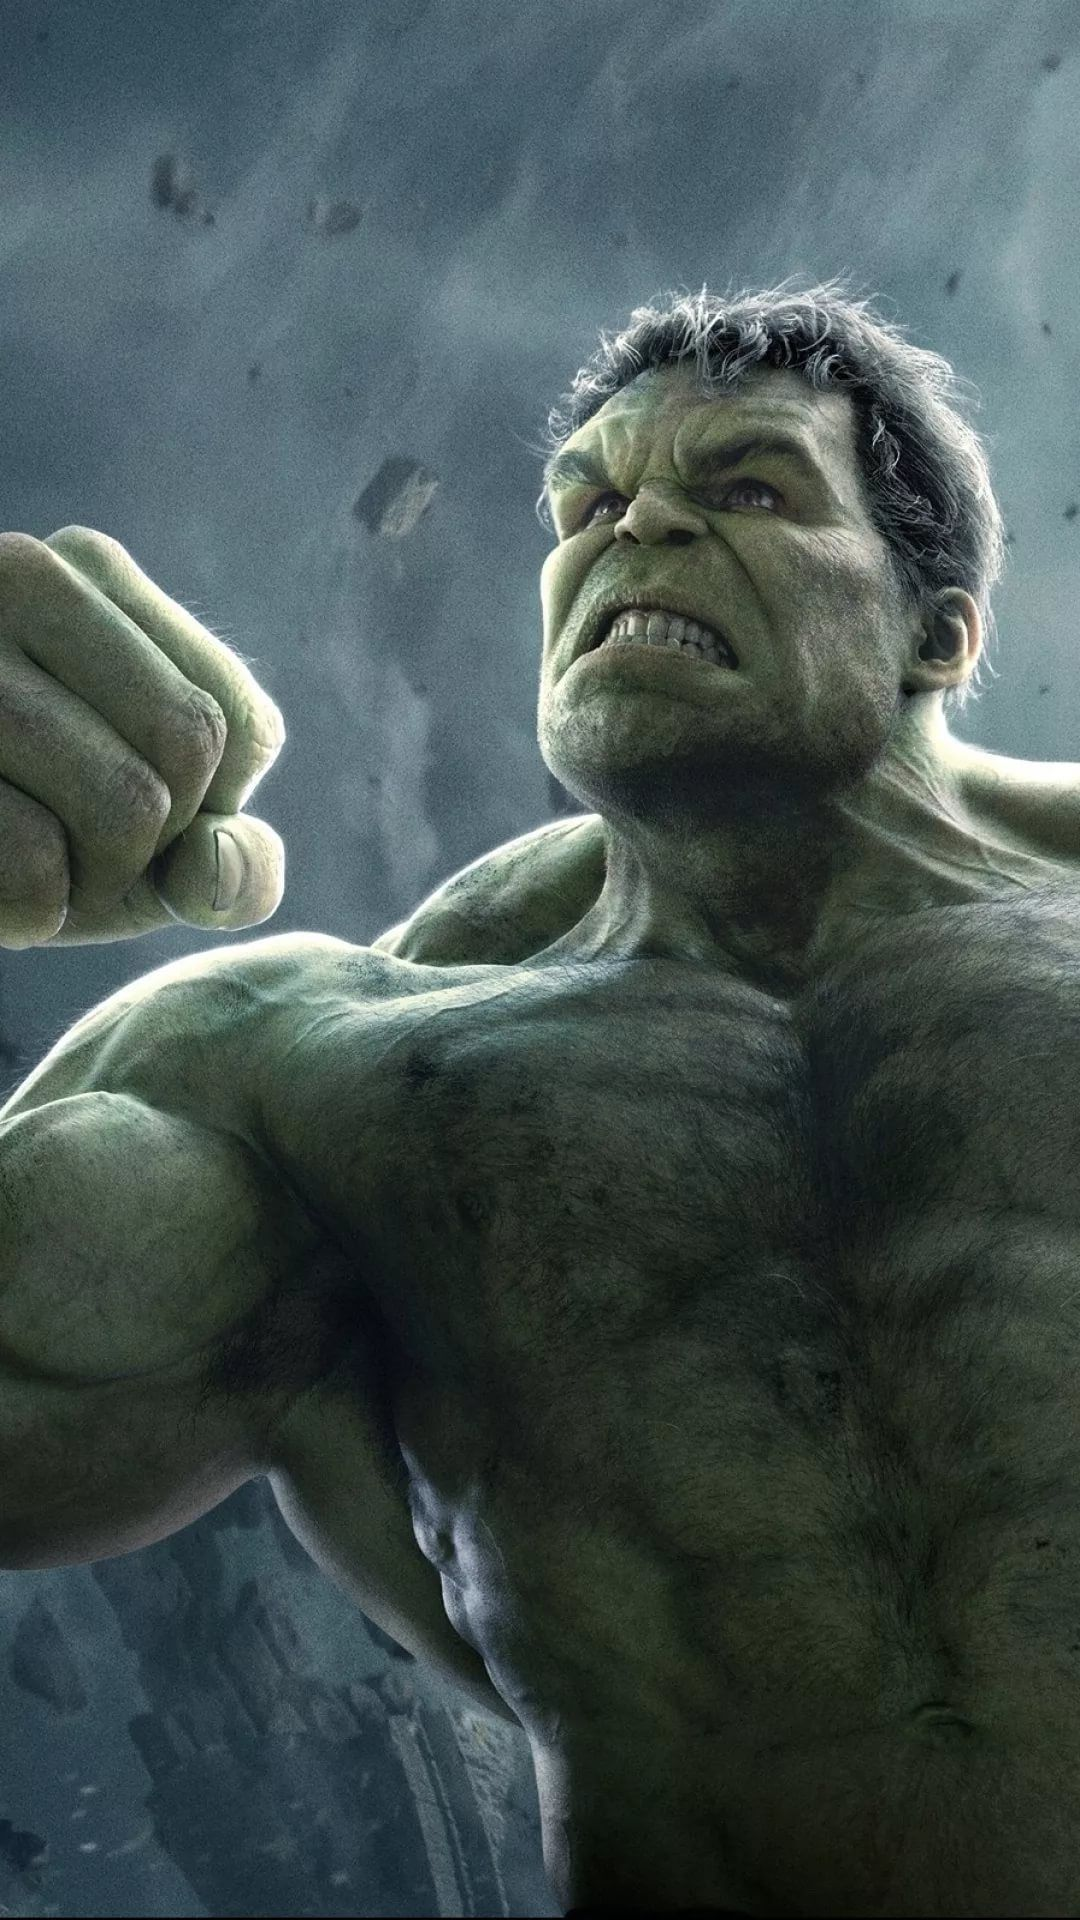 Hulk D Apple iPhone wallpaper